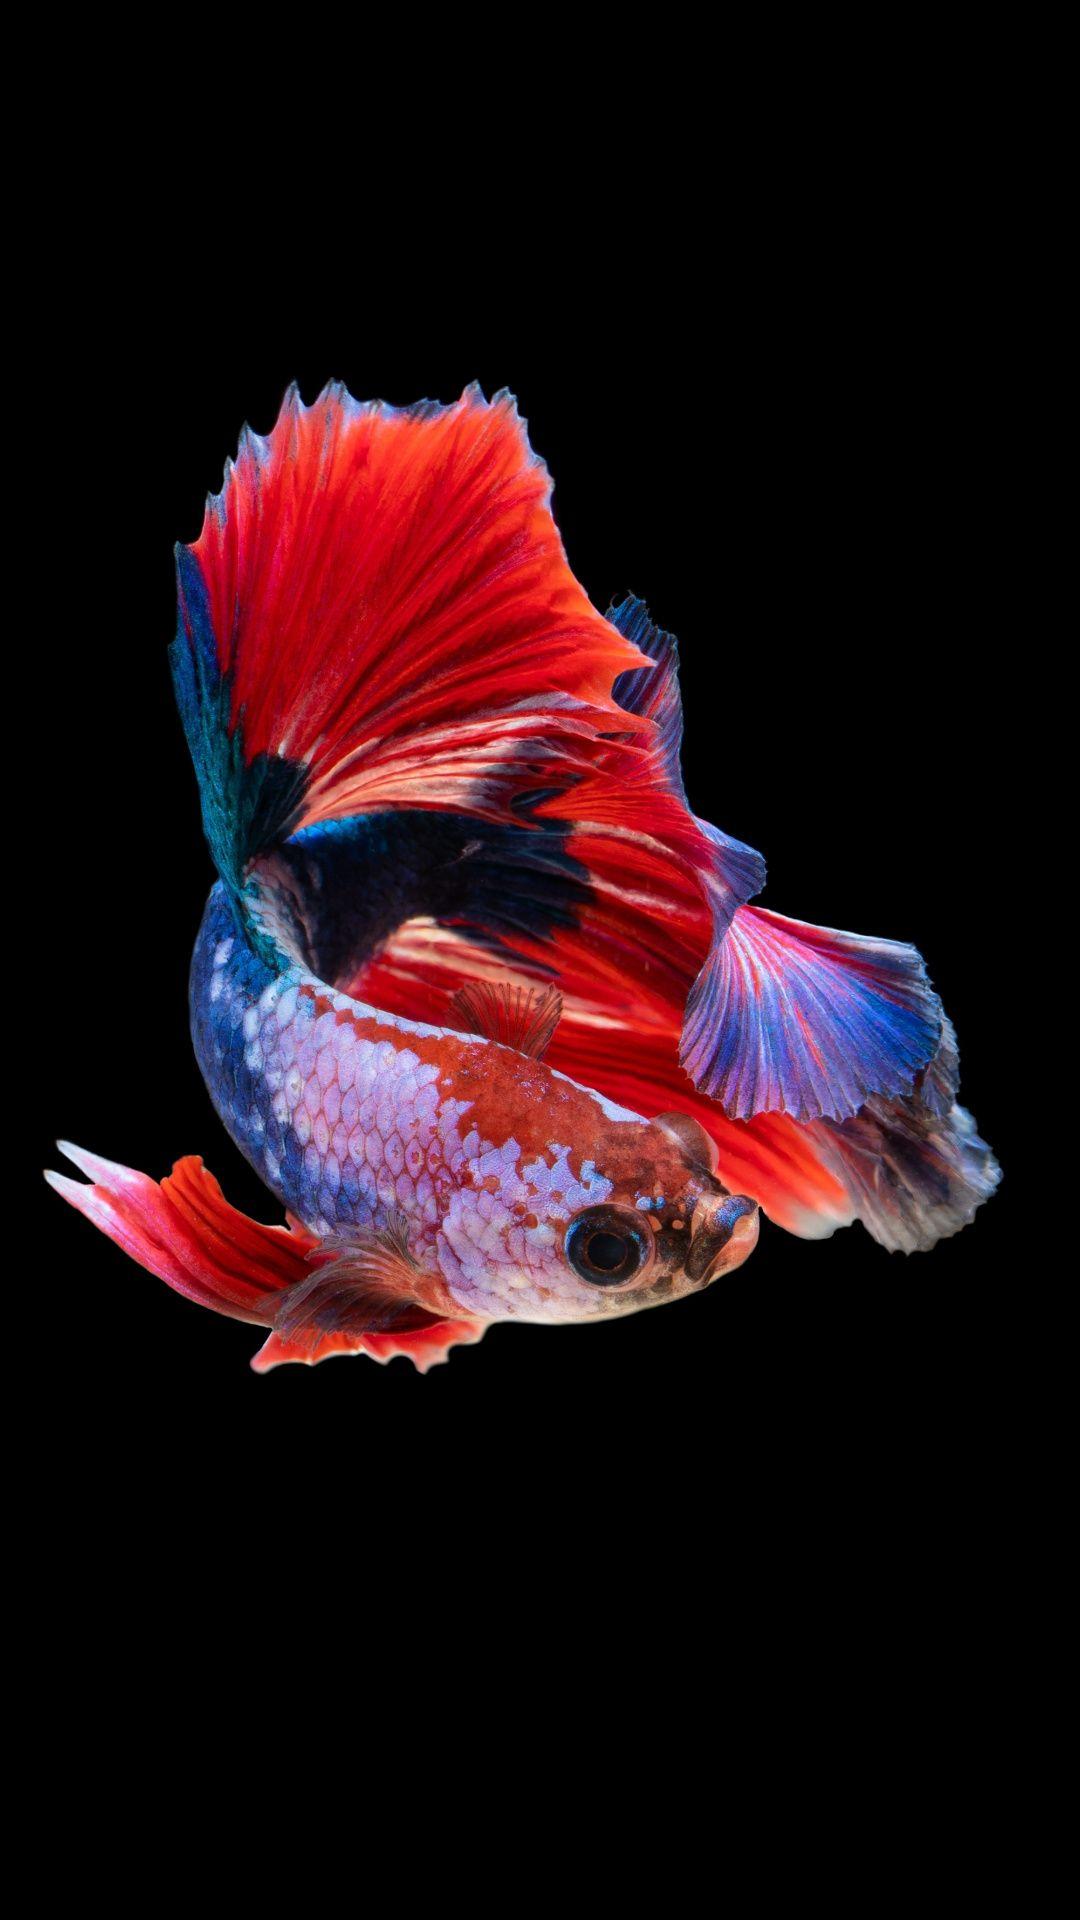 Siamese Fighting Fish Betta Colorufl Fish 1080x1920 Wallpaper Photos Of Fish Animal Wallpaper Fish Wallpaper